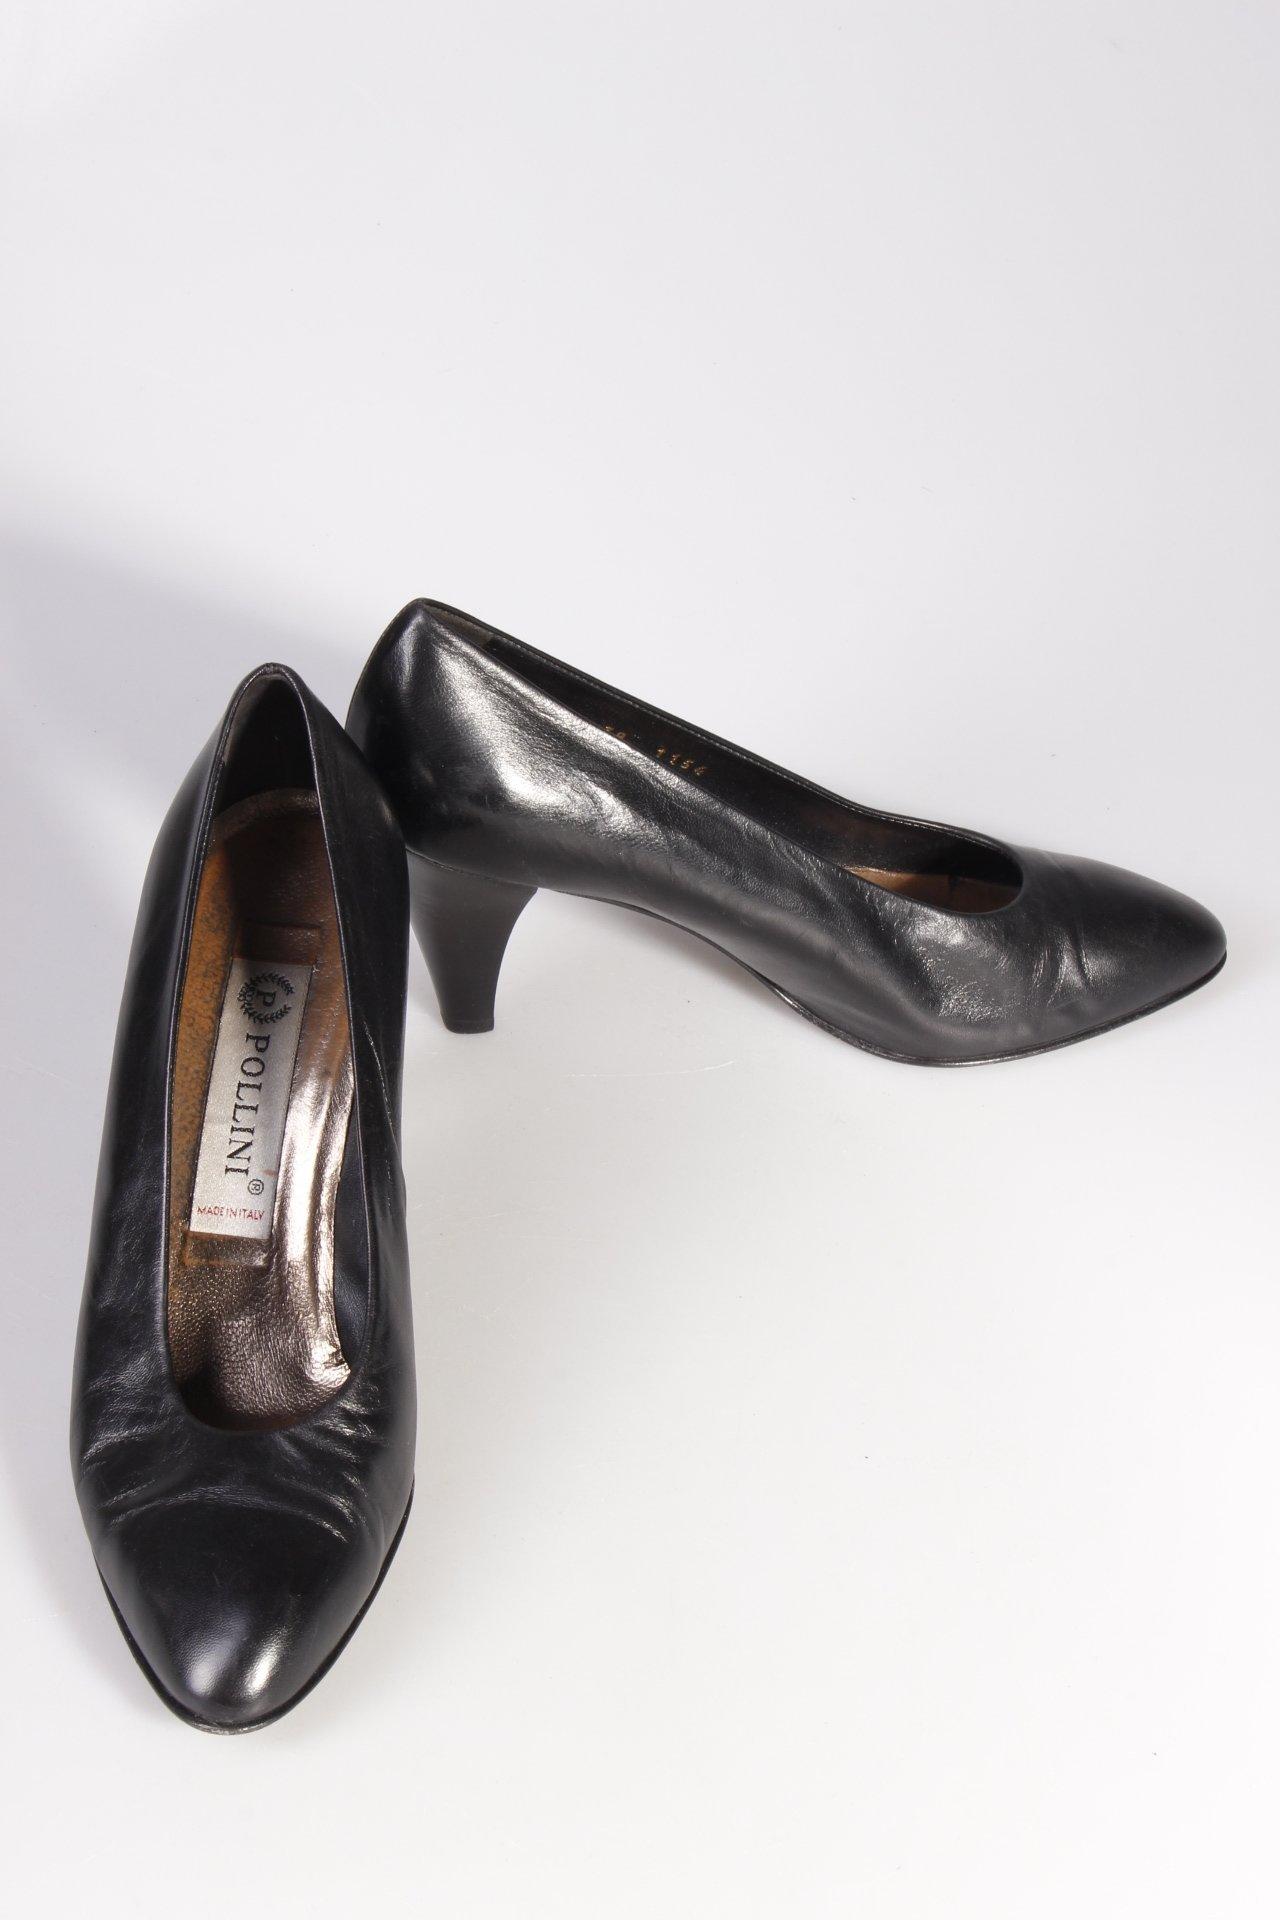 POLLINI Pumps schwarz Schuhes Damen Gr. DE 38 Schuhe Schuhes schwarz Leder Damenschuhe 00e0ac